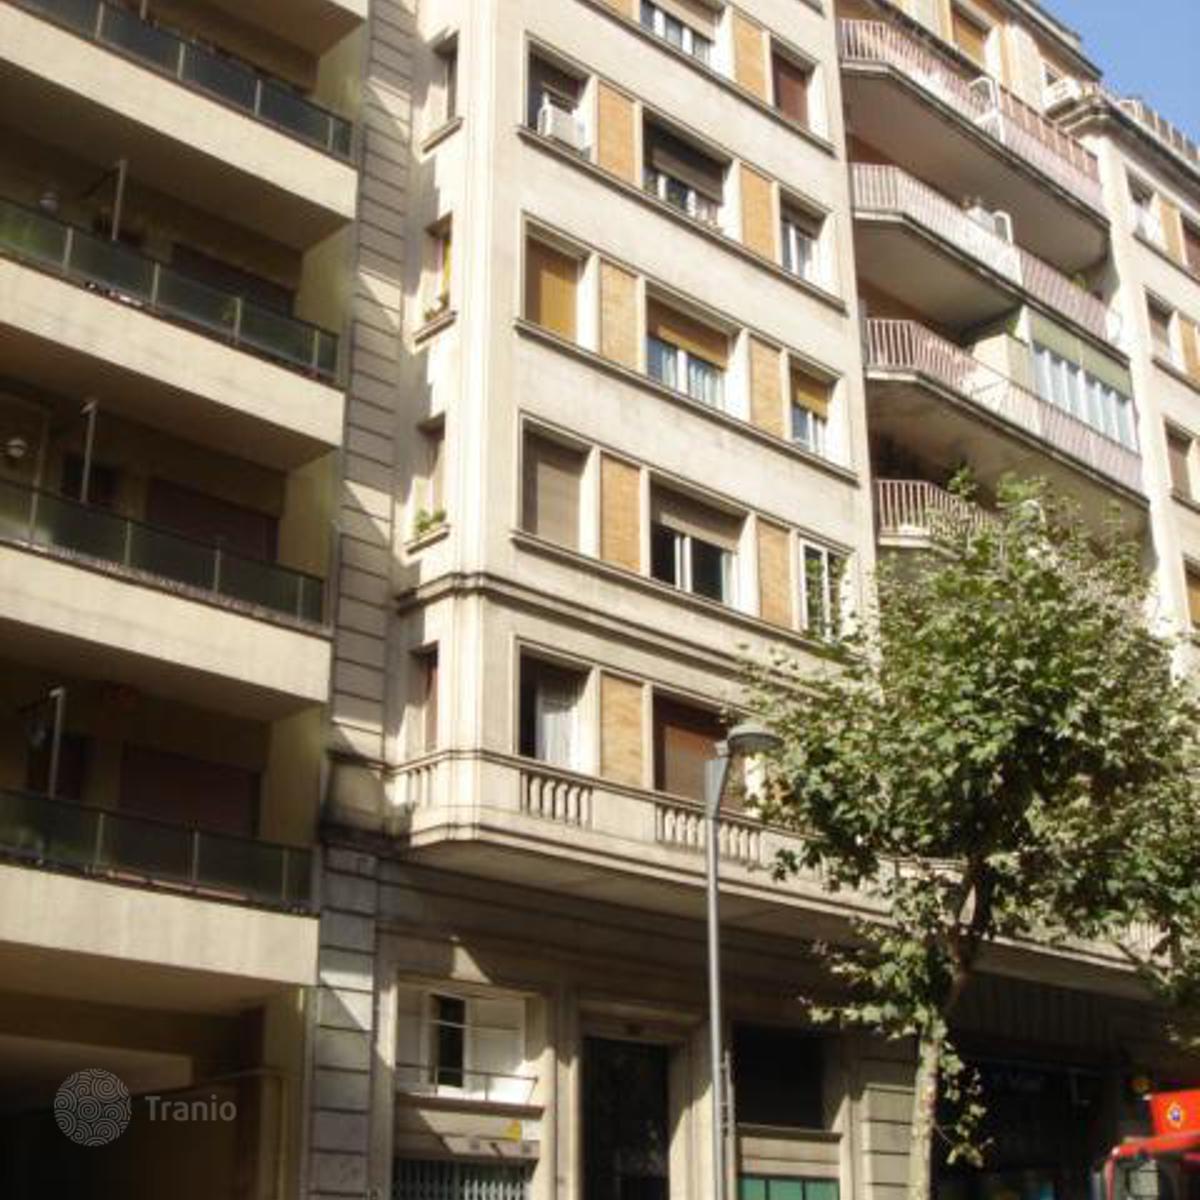 Barcelona Apartments: Listing #1415065 In Barcelona, Catalonia, Spain